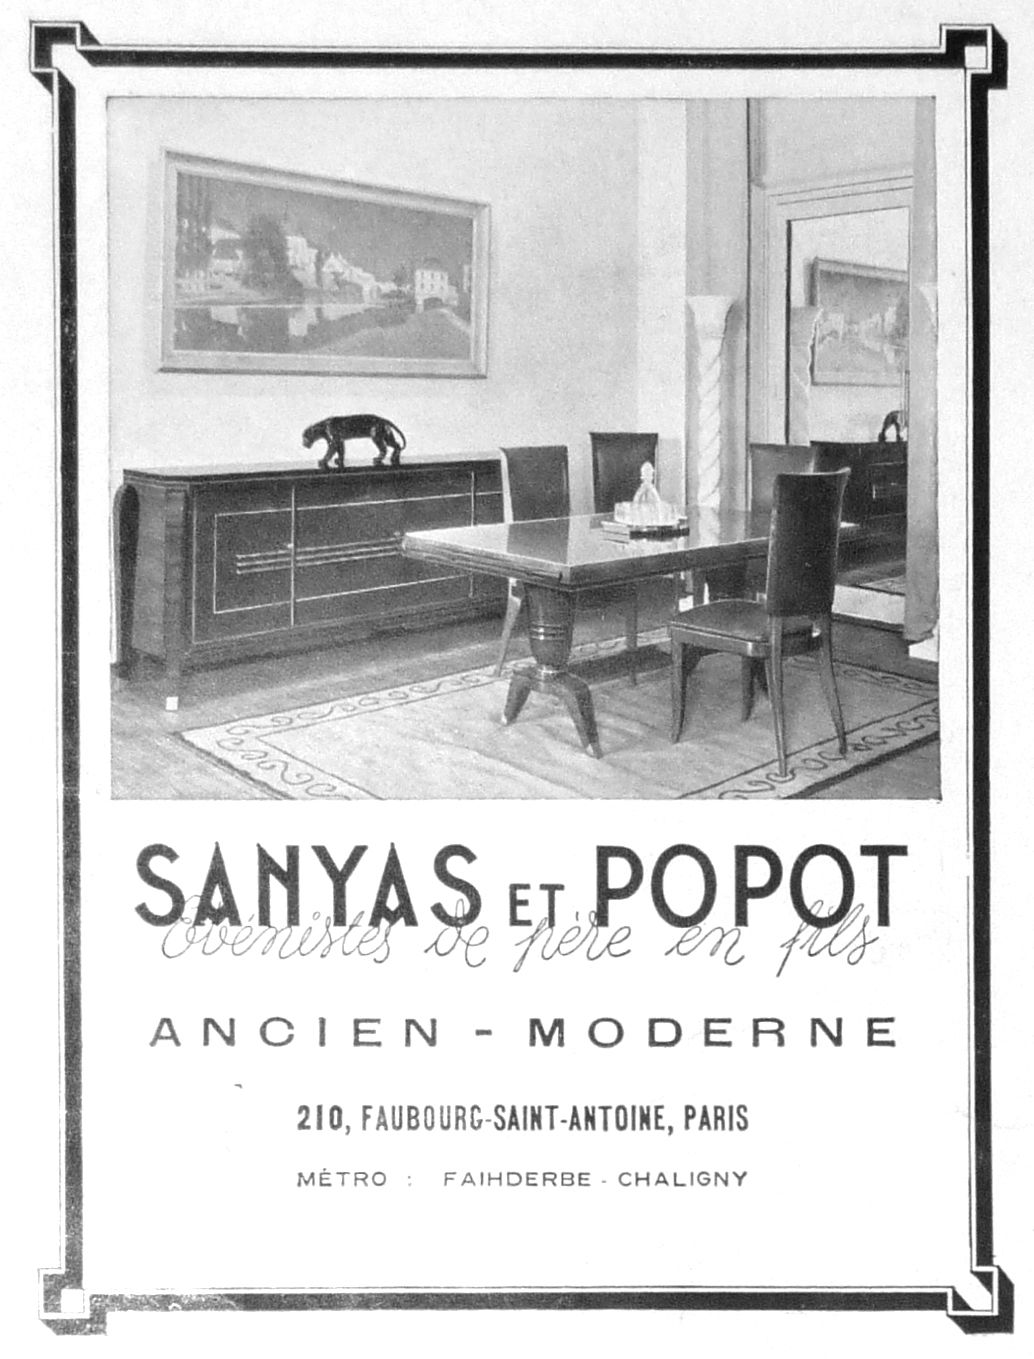 Vintage Old Ads France 1943 Anciennes Publicites Sanyas Popot Meubles Furniture Vintage Ads Paris Metro Furniture Design